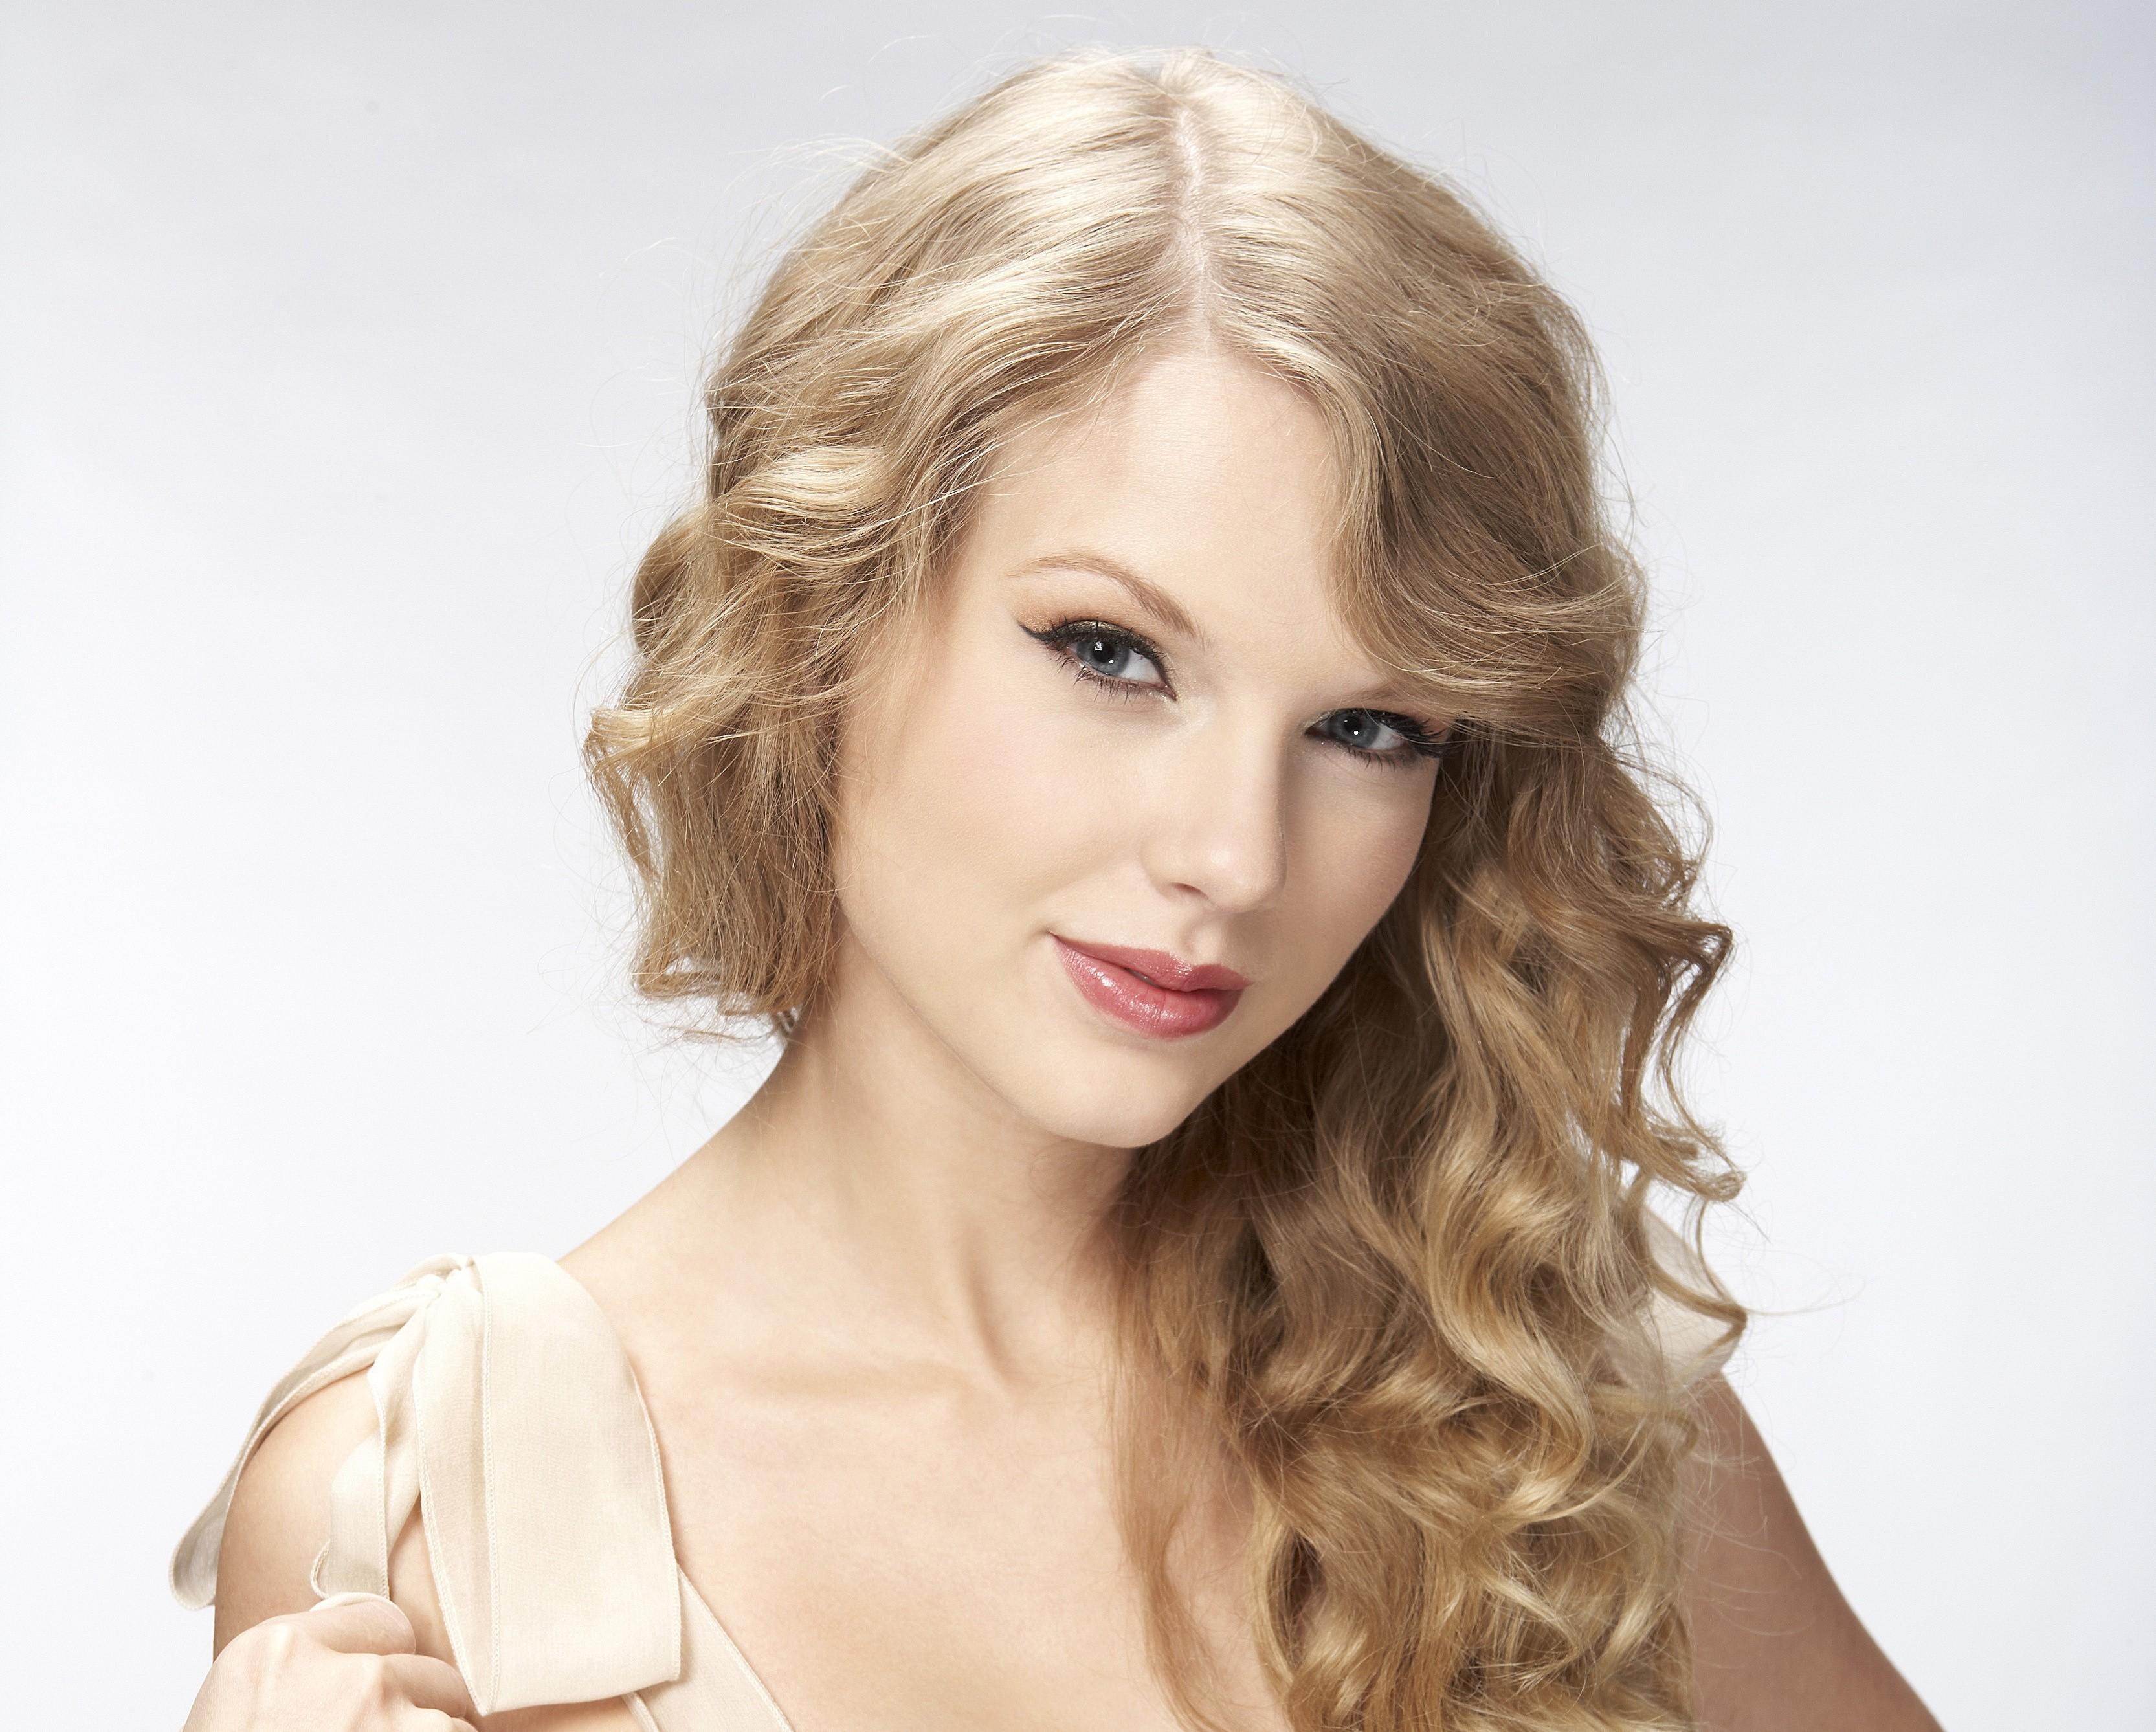 Wallpaper Face Women Blonde Long Hair Blue Eyes Singer